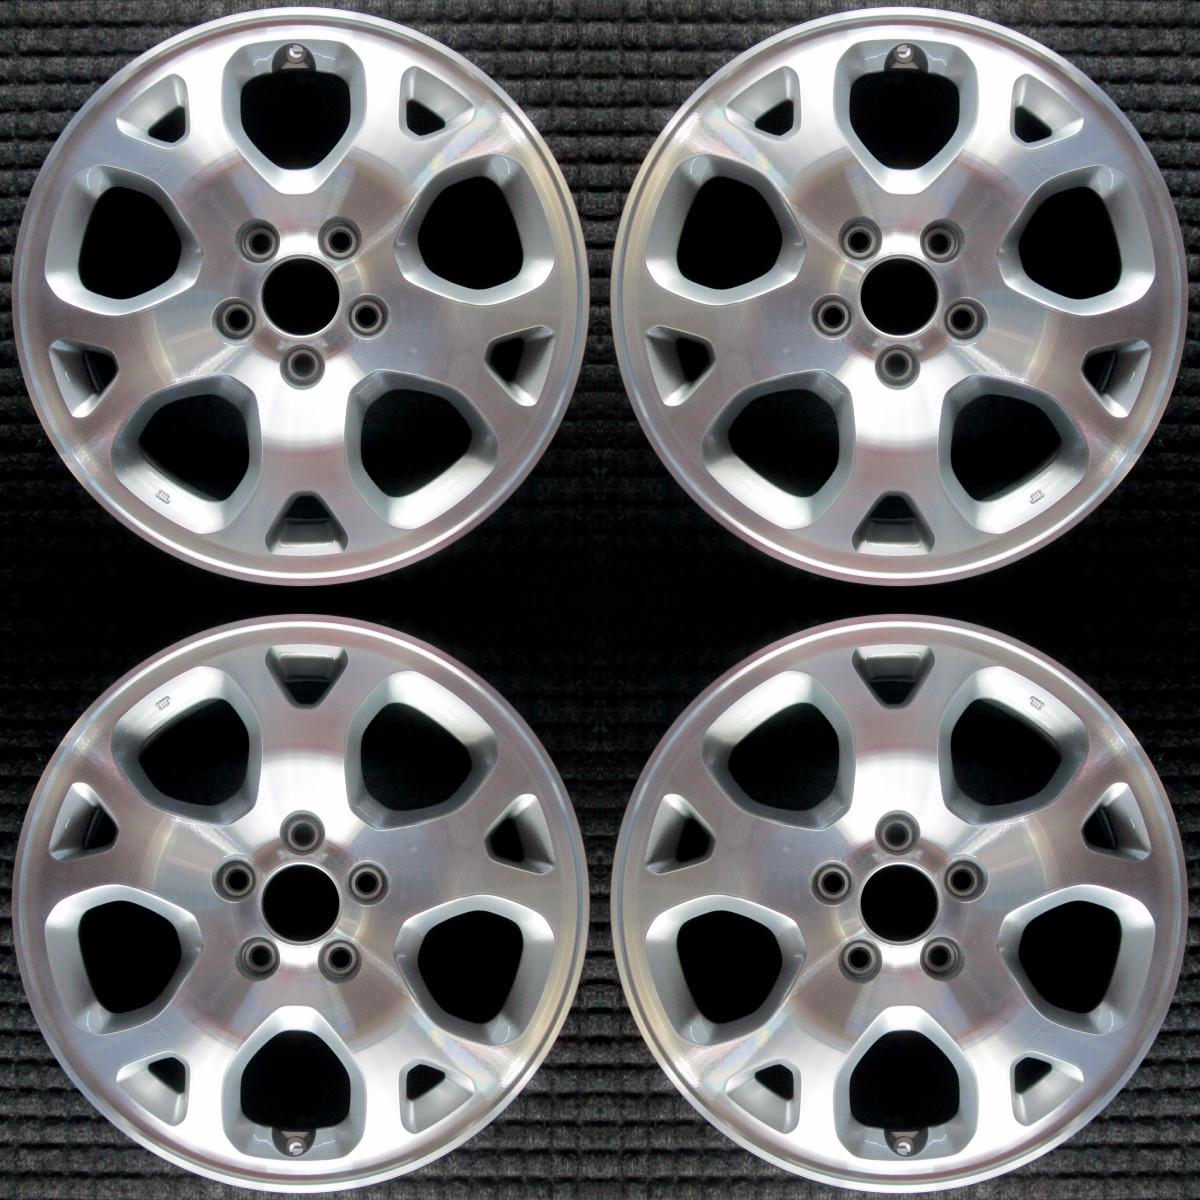 "Acura MDX Machined W/ Silver Pockets 17"" OEM Wheel Set"